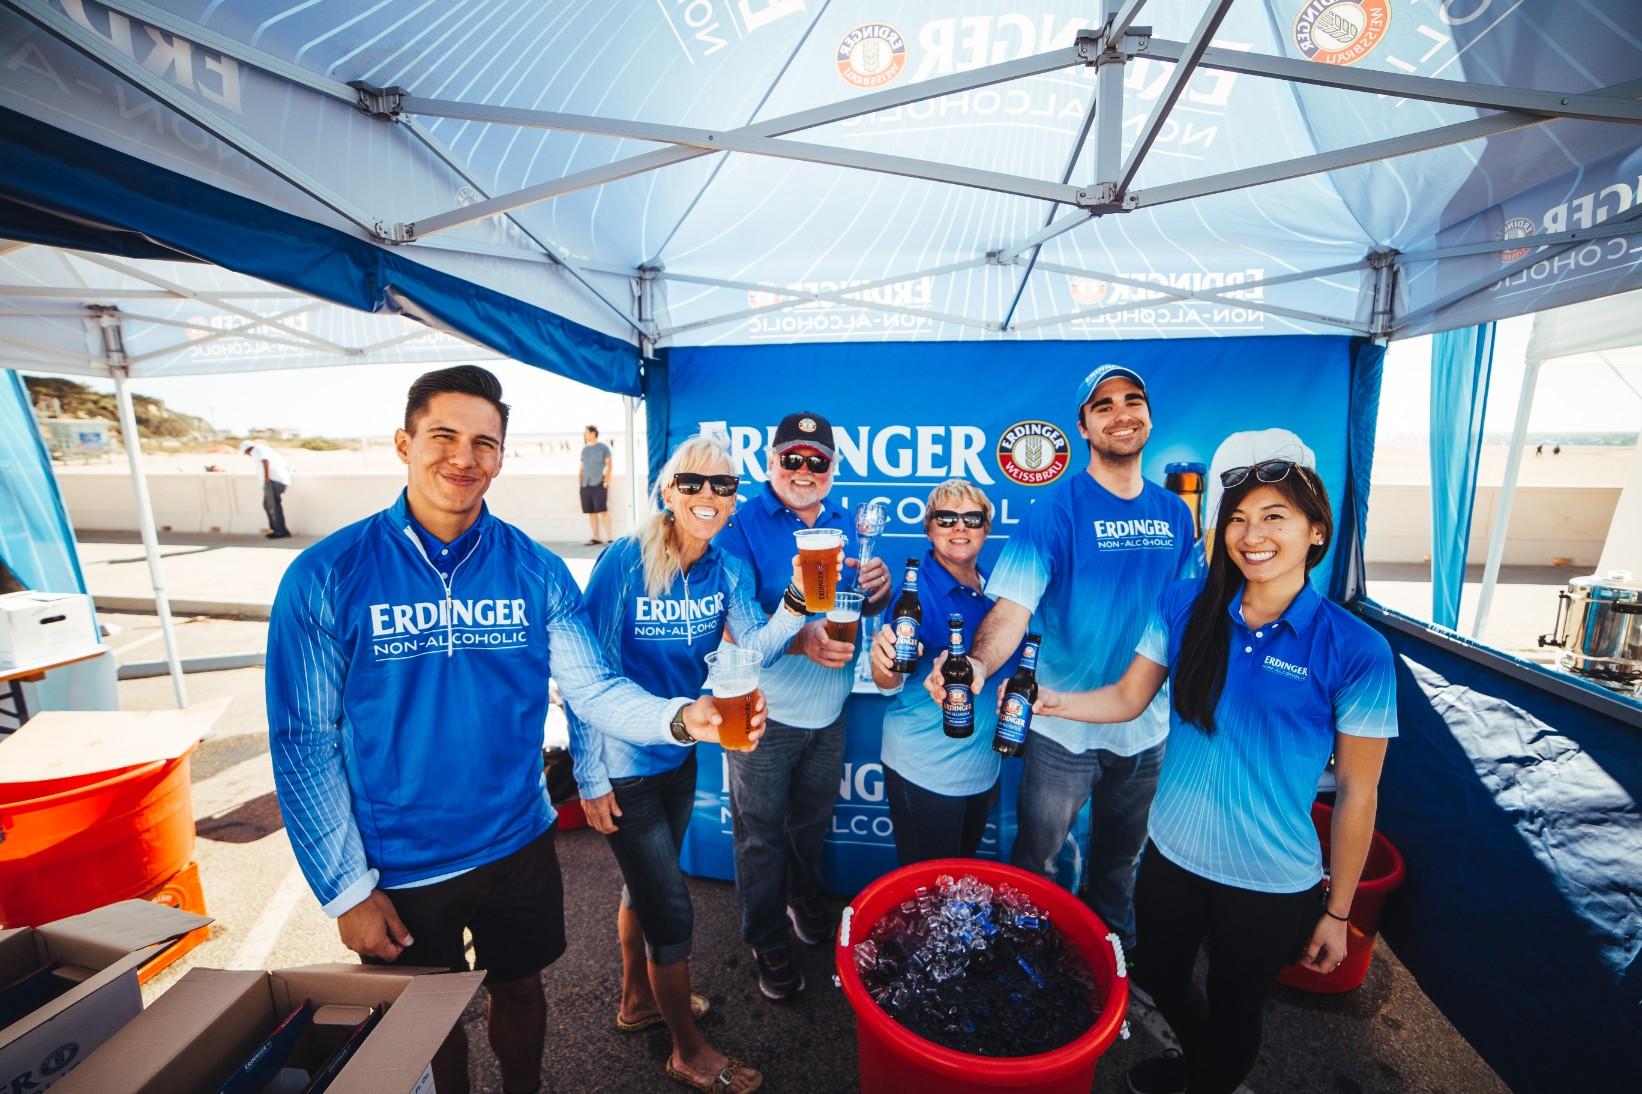 Erdinger Non-Alcoholic was the official beverage partner of the Malibu Half Marathon & 5K.